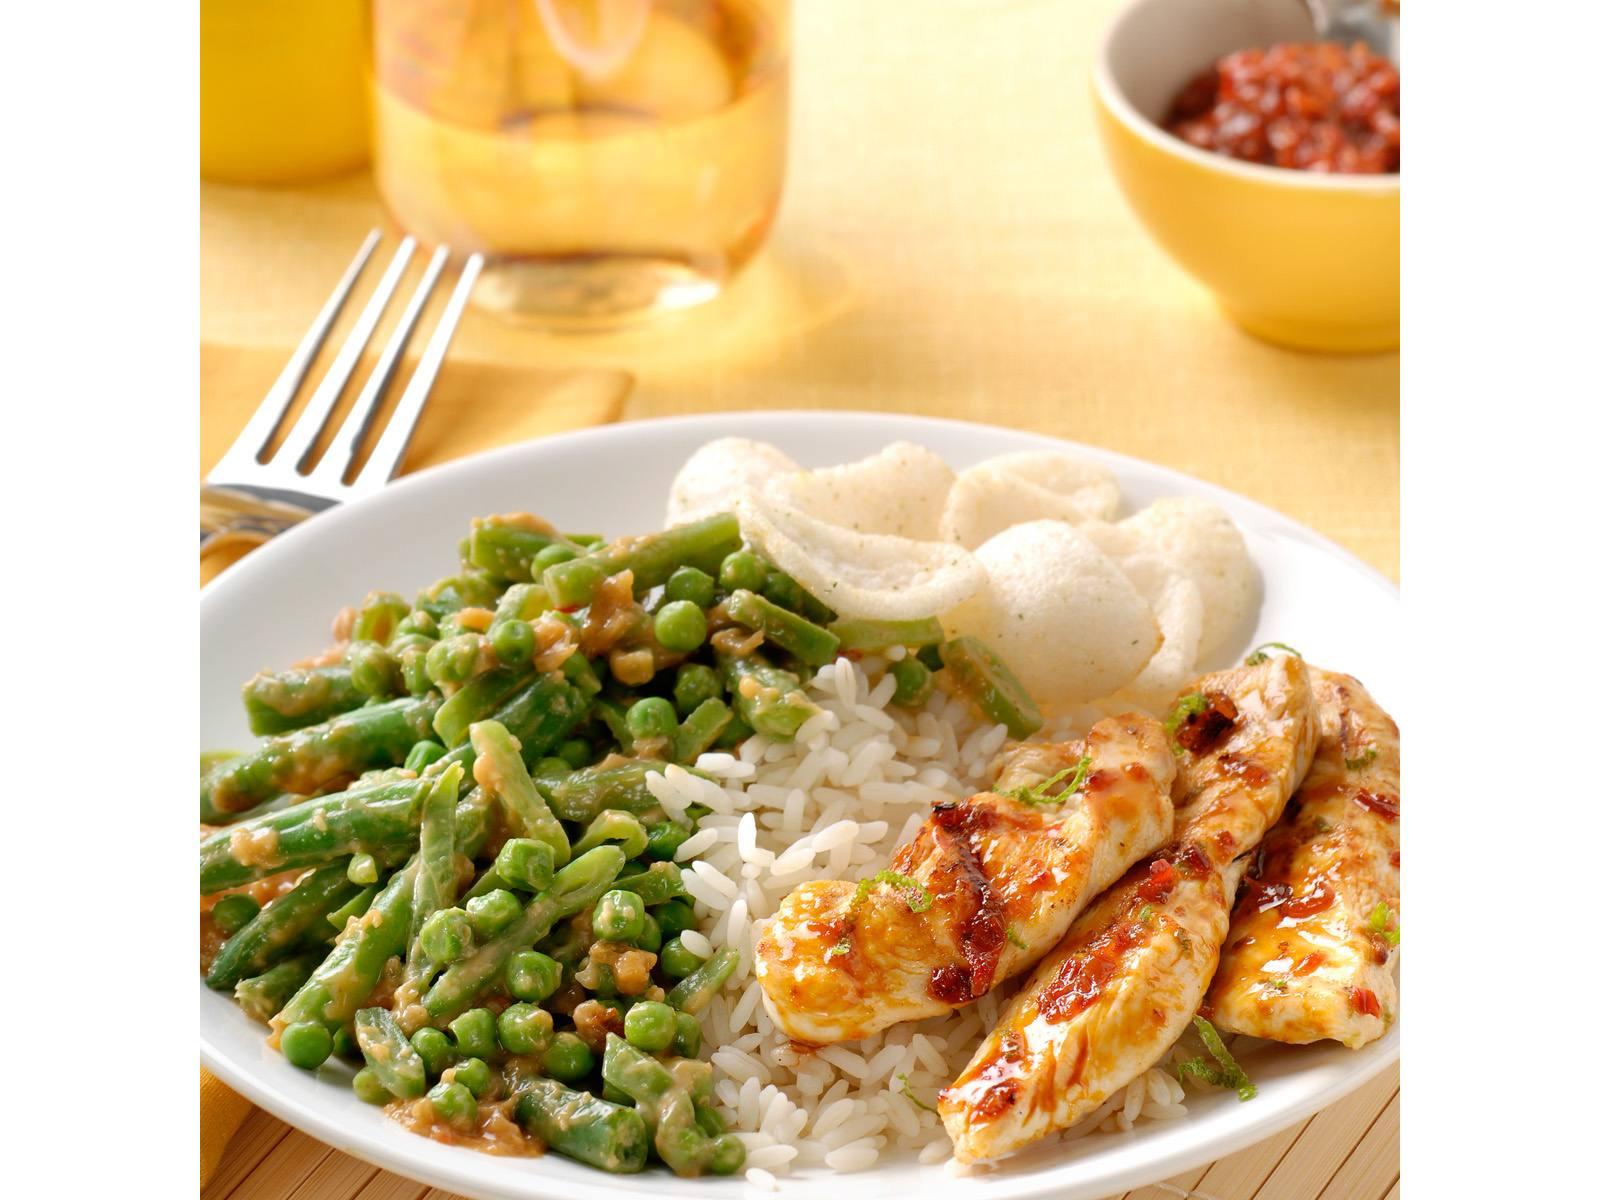 Gemengde Sajoerboontjes met limoen en gegrilde kip Badjak